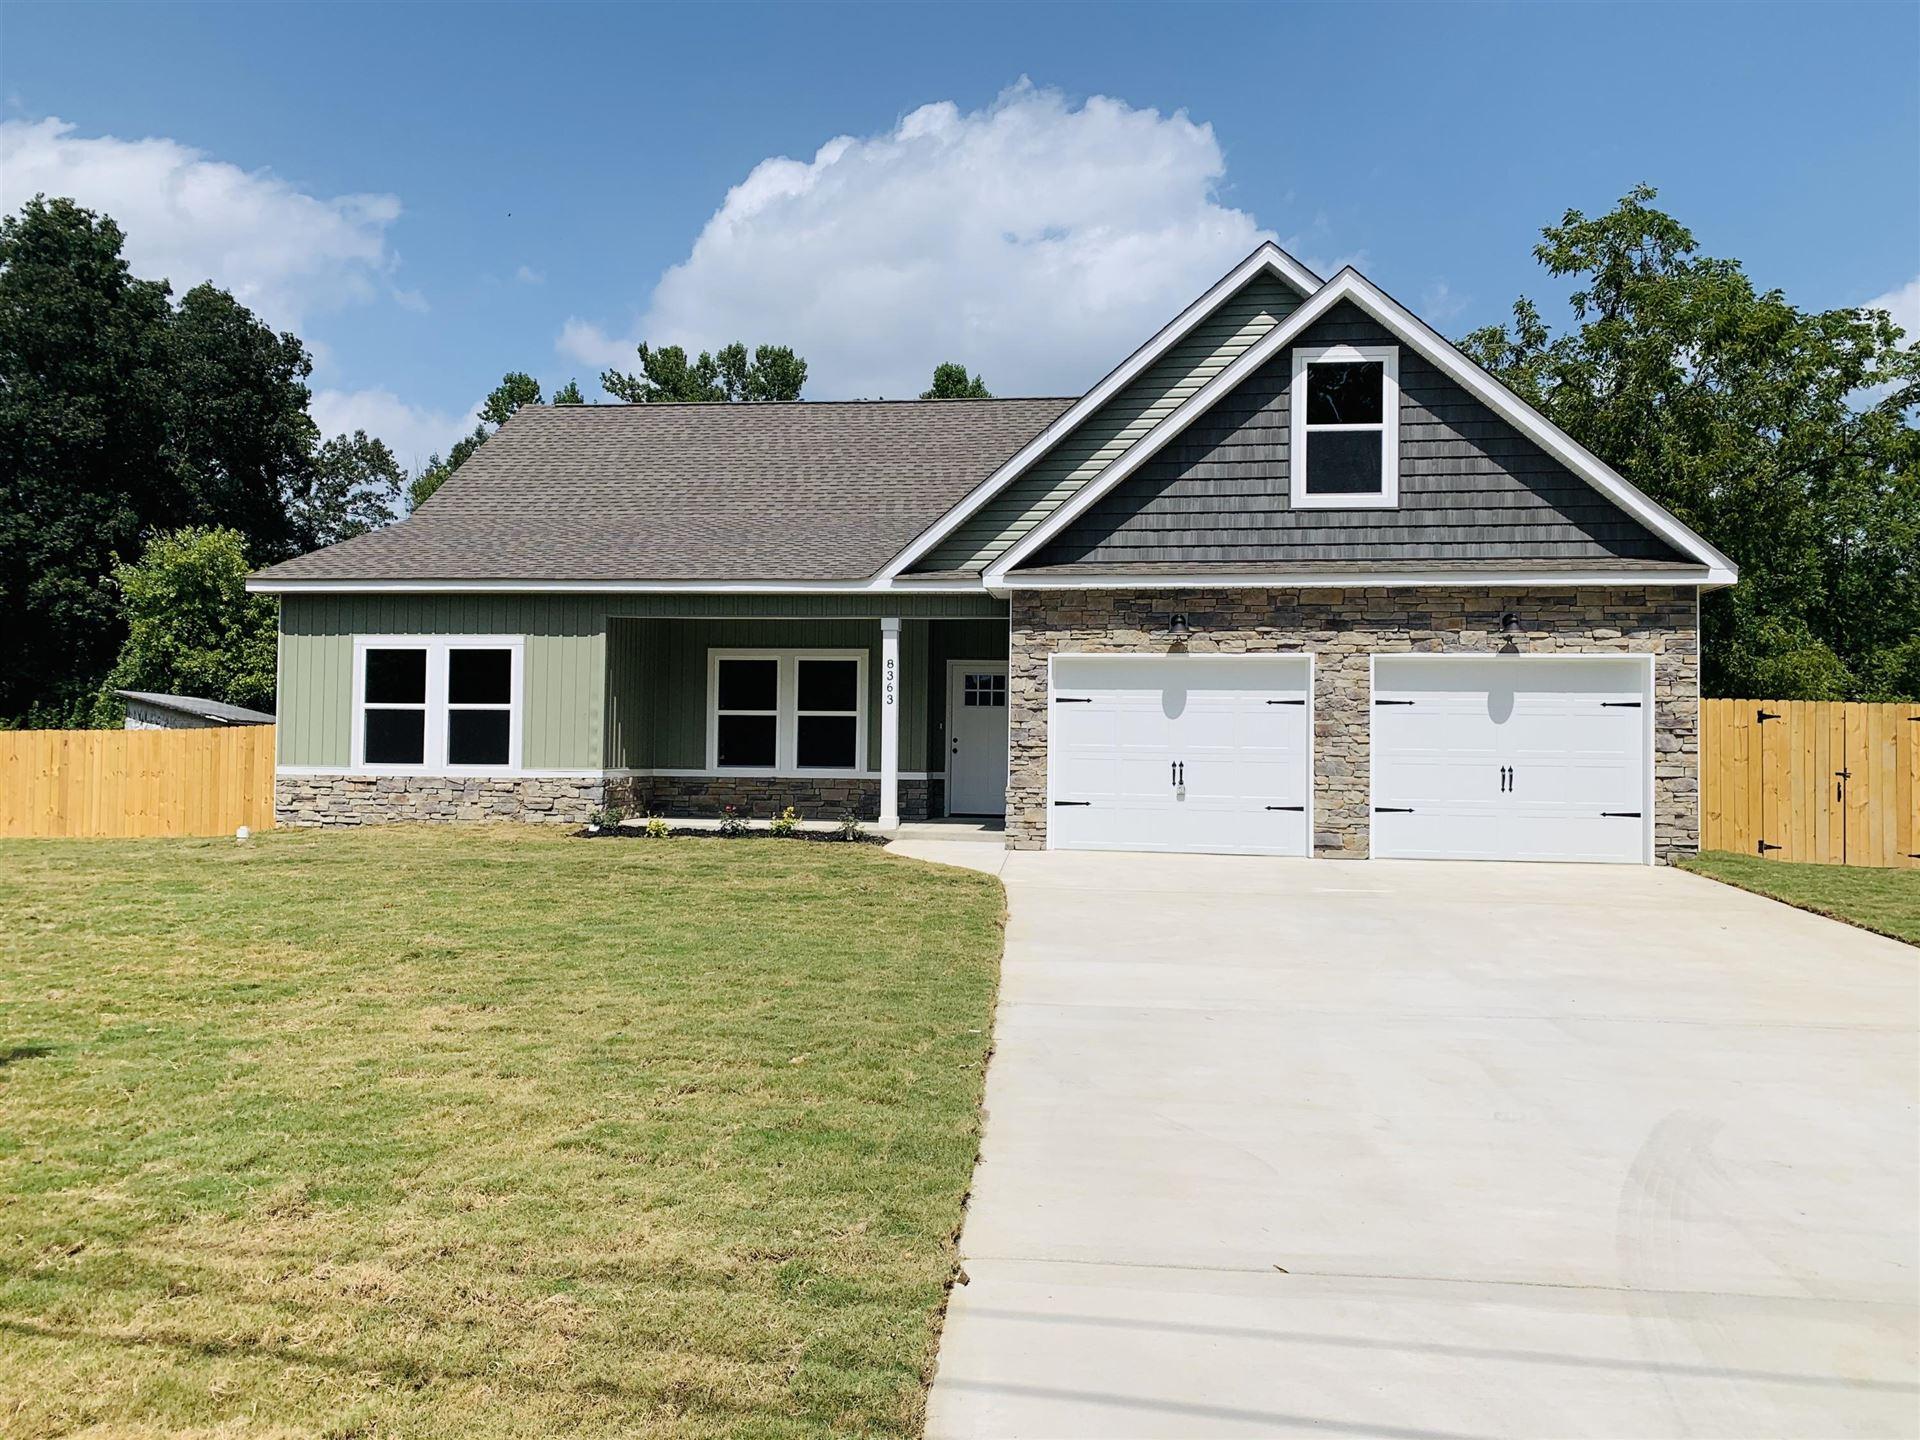 8363 Oak Dr, Chattanooga, TN 37421 - #: 1319022